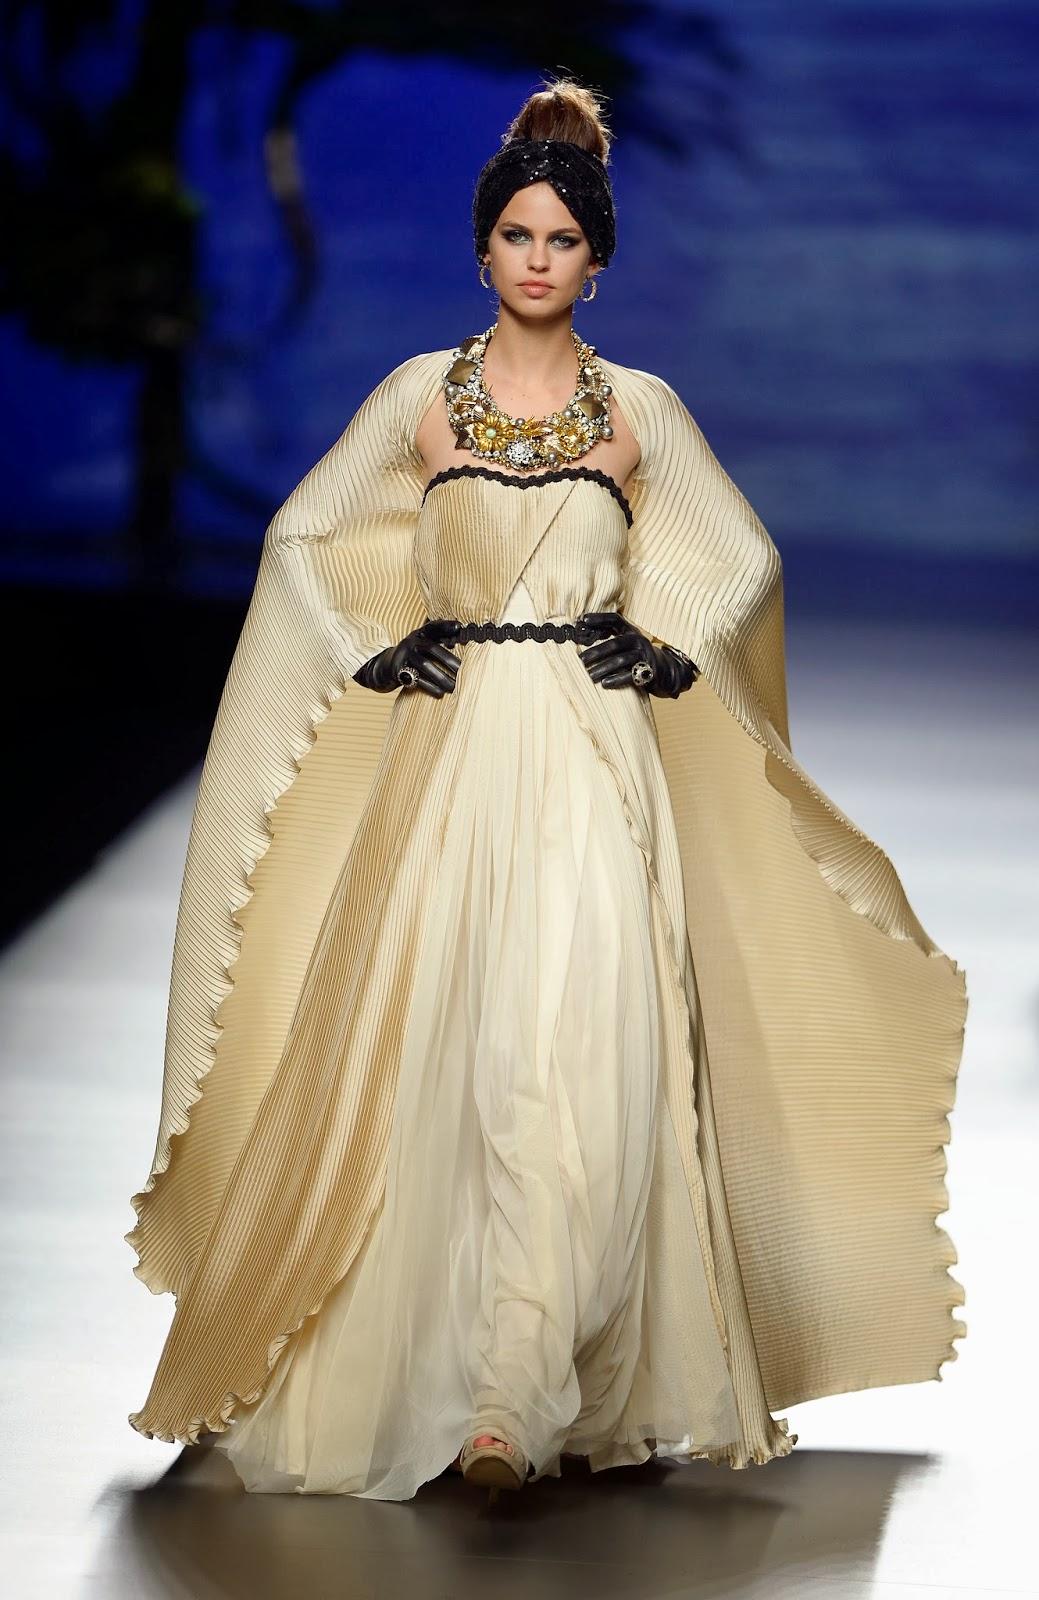 Ailanto, Autumn/Winter 2014-2015, Collection, Creation, Designer, Fashion, Fashion Week, Francis Montesinos, Lucchino, Madrid, Madrid Fashion Week, Showbiz, Victorio,